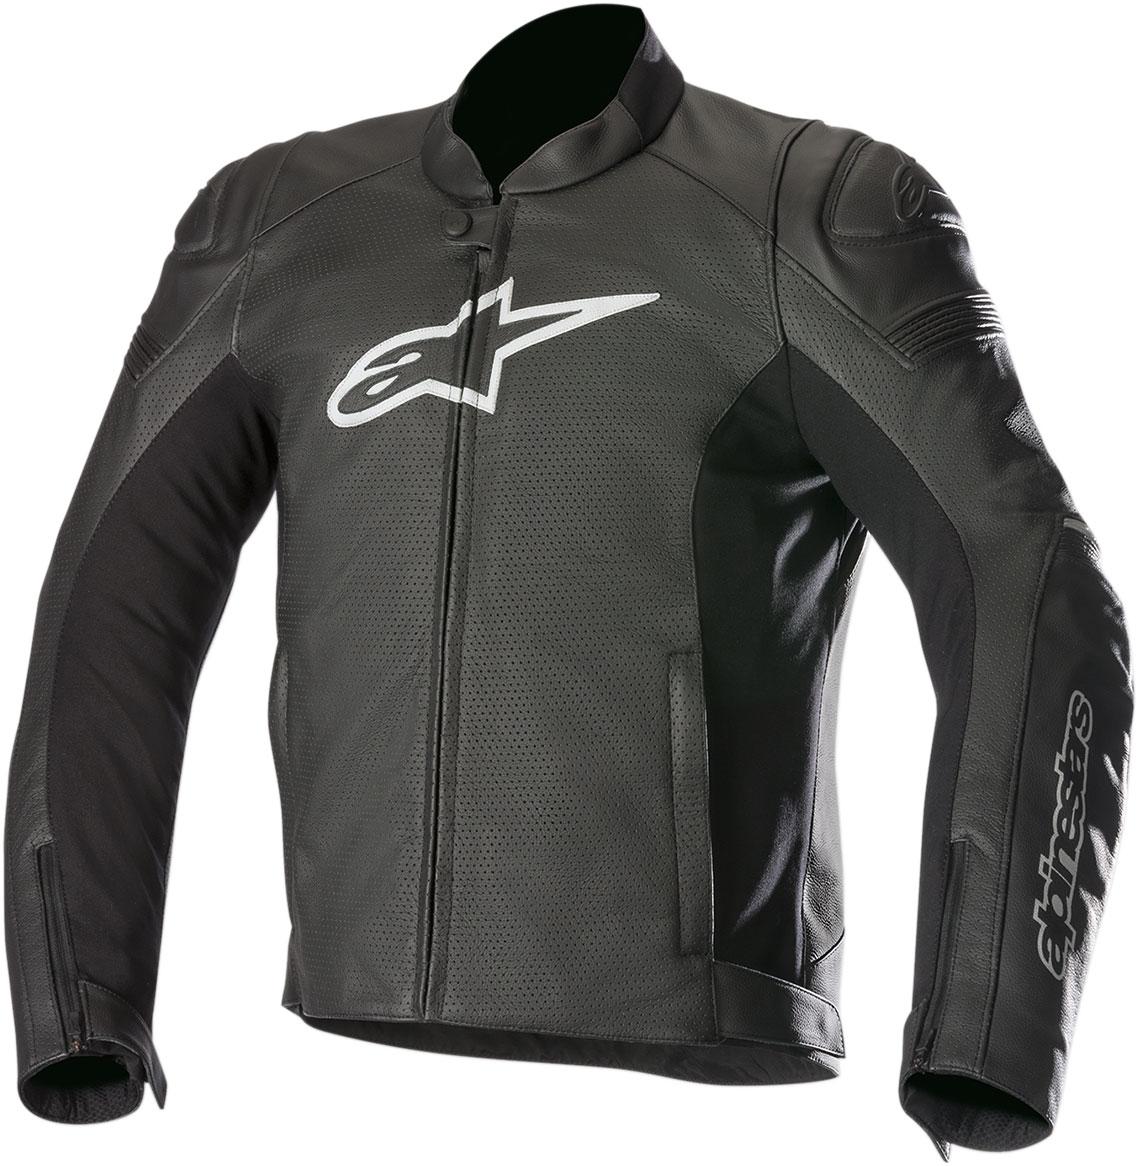 Alpinestars SP-1 AIRFLOW Perforated Leather Jacket (Black)